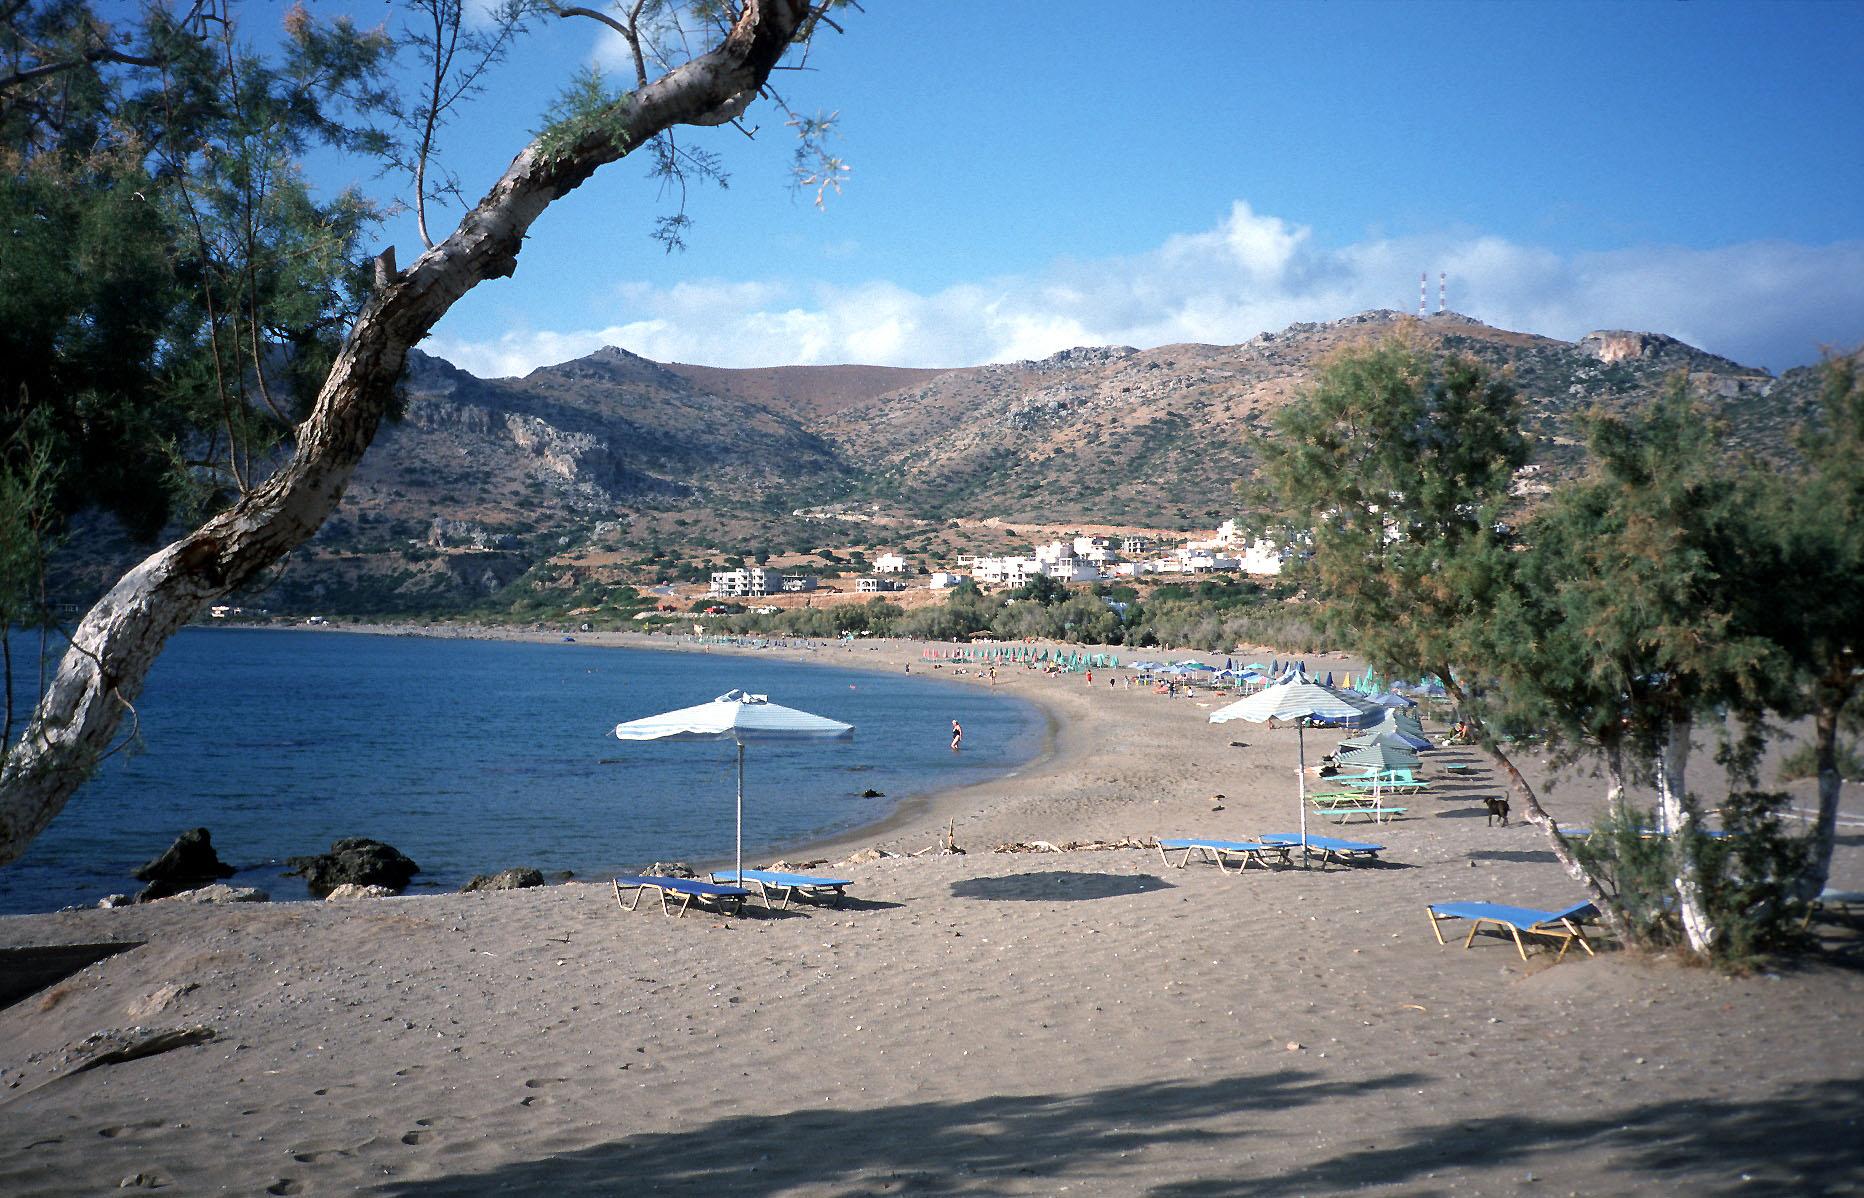 Crete greece, Crete and Greece on Pinterest